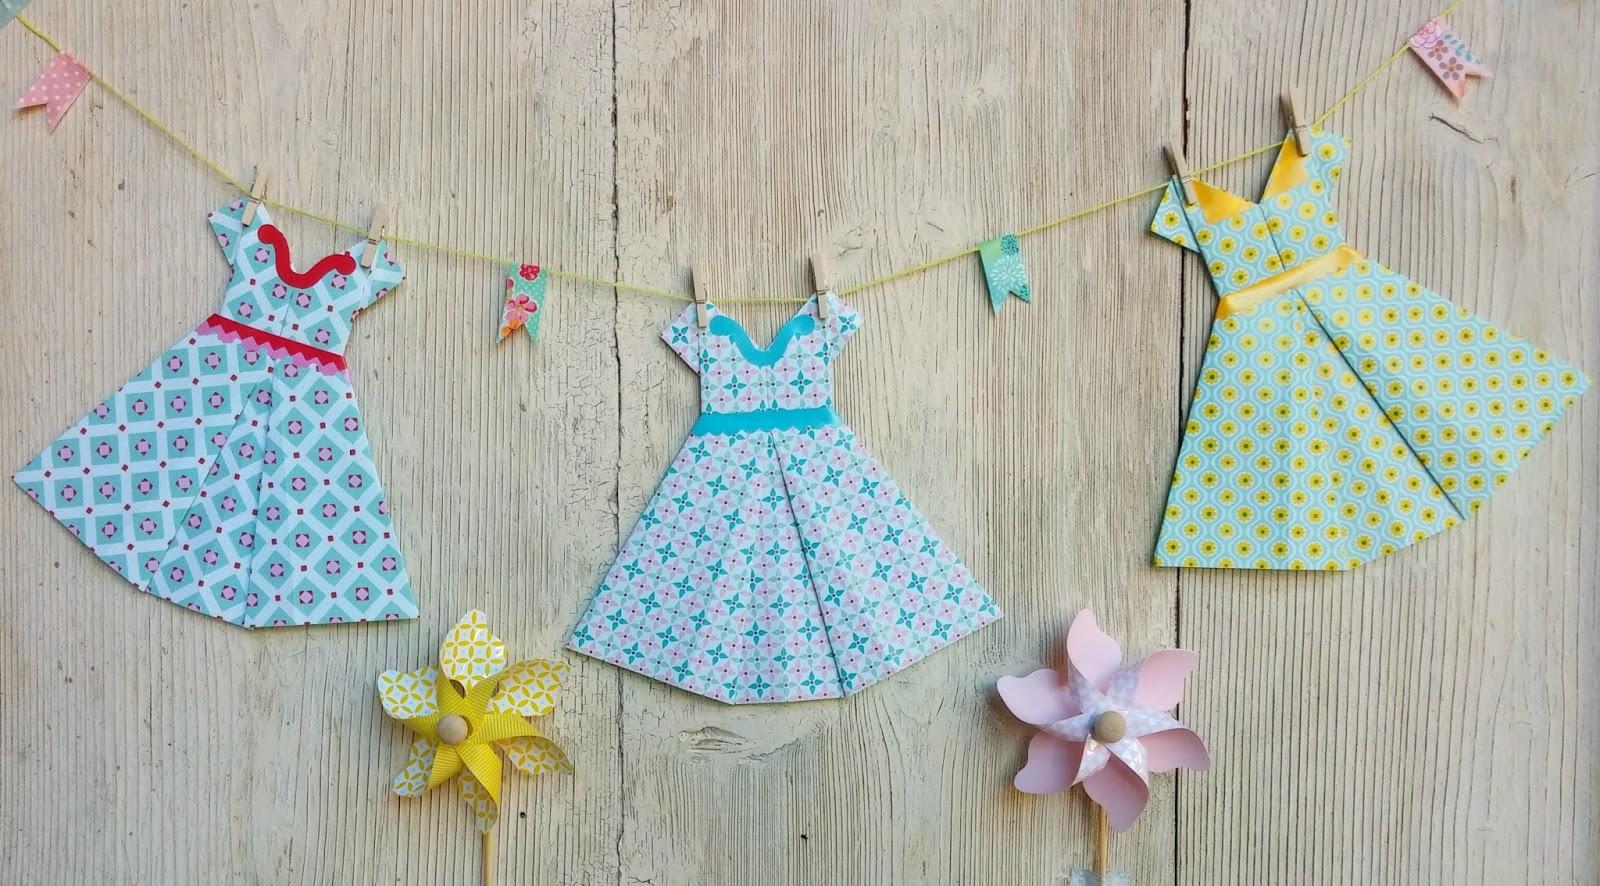 ella amp nestas little room summer gift party origami